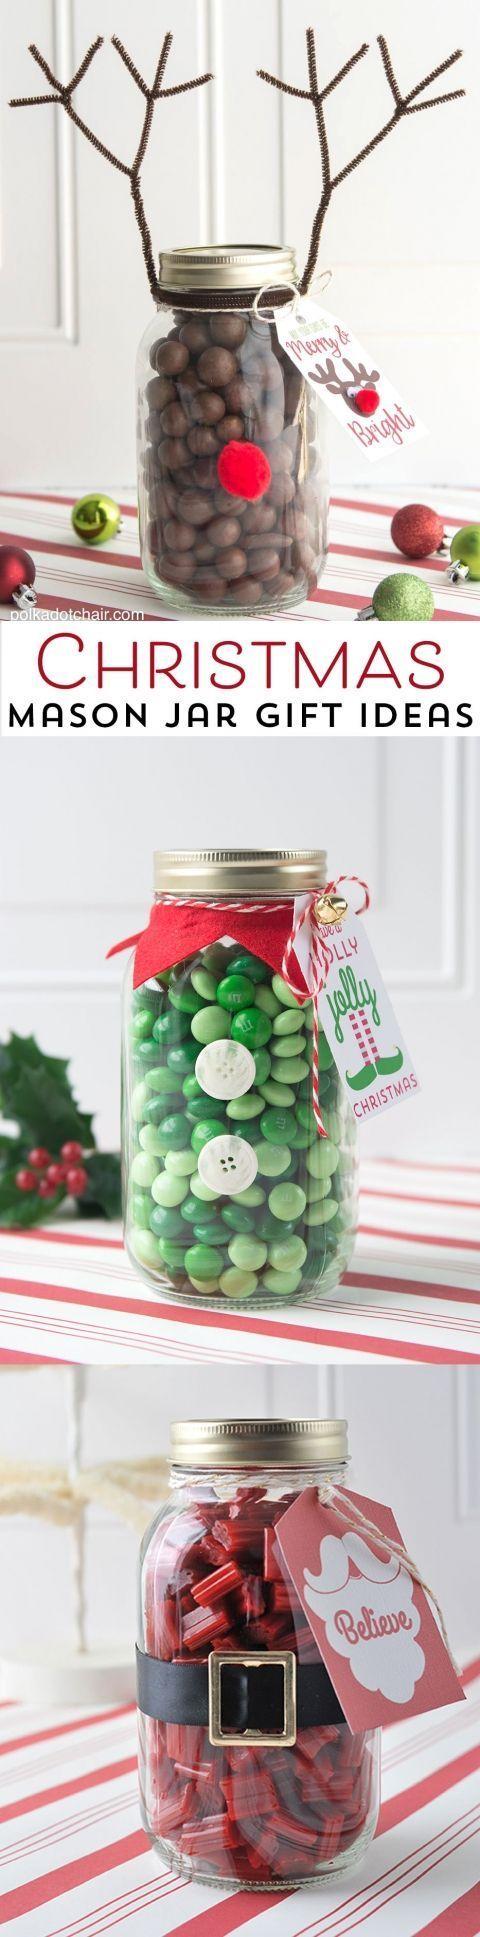 Reindeer Christmas Mason Jar Gift Idea | Pinterest | Mason jar ...